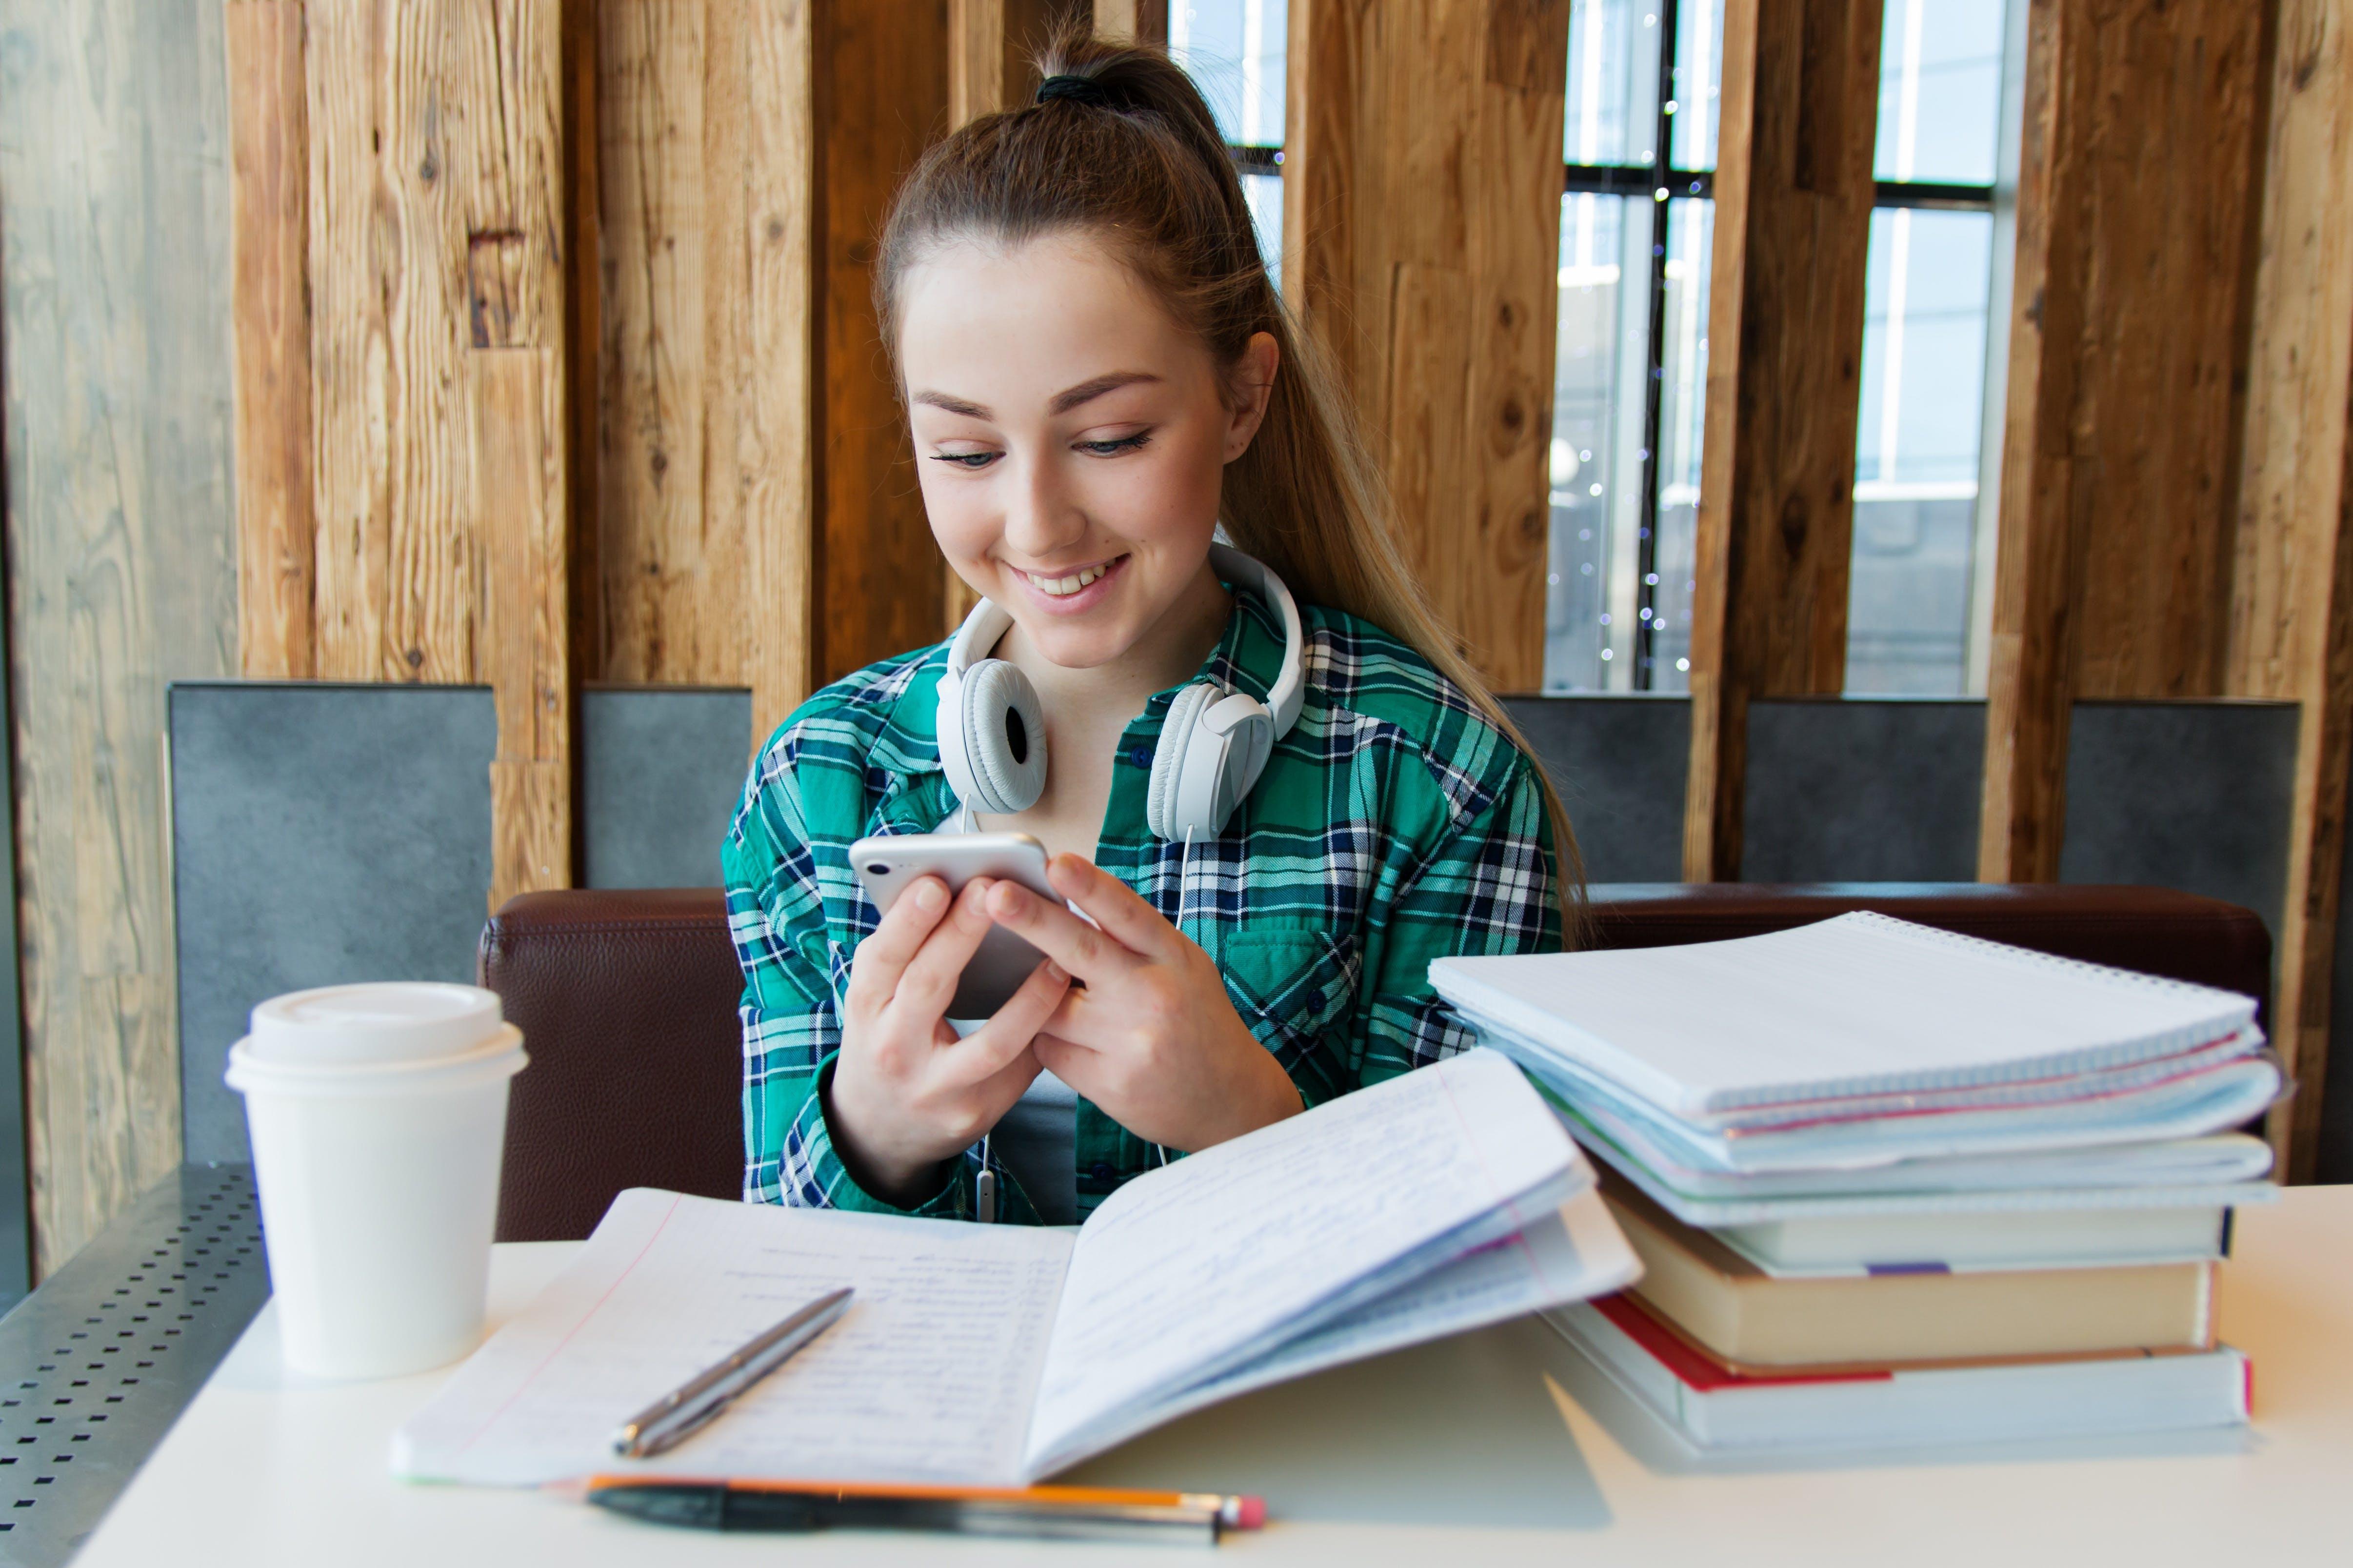 Titelbild-War-for-Talents-Talent-Mädchen-Smartphone-Studentin-pixabay-3718531-nastya_gepp